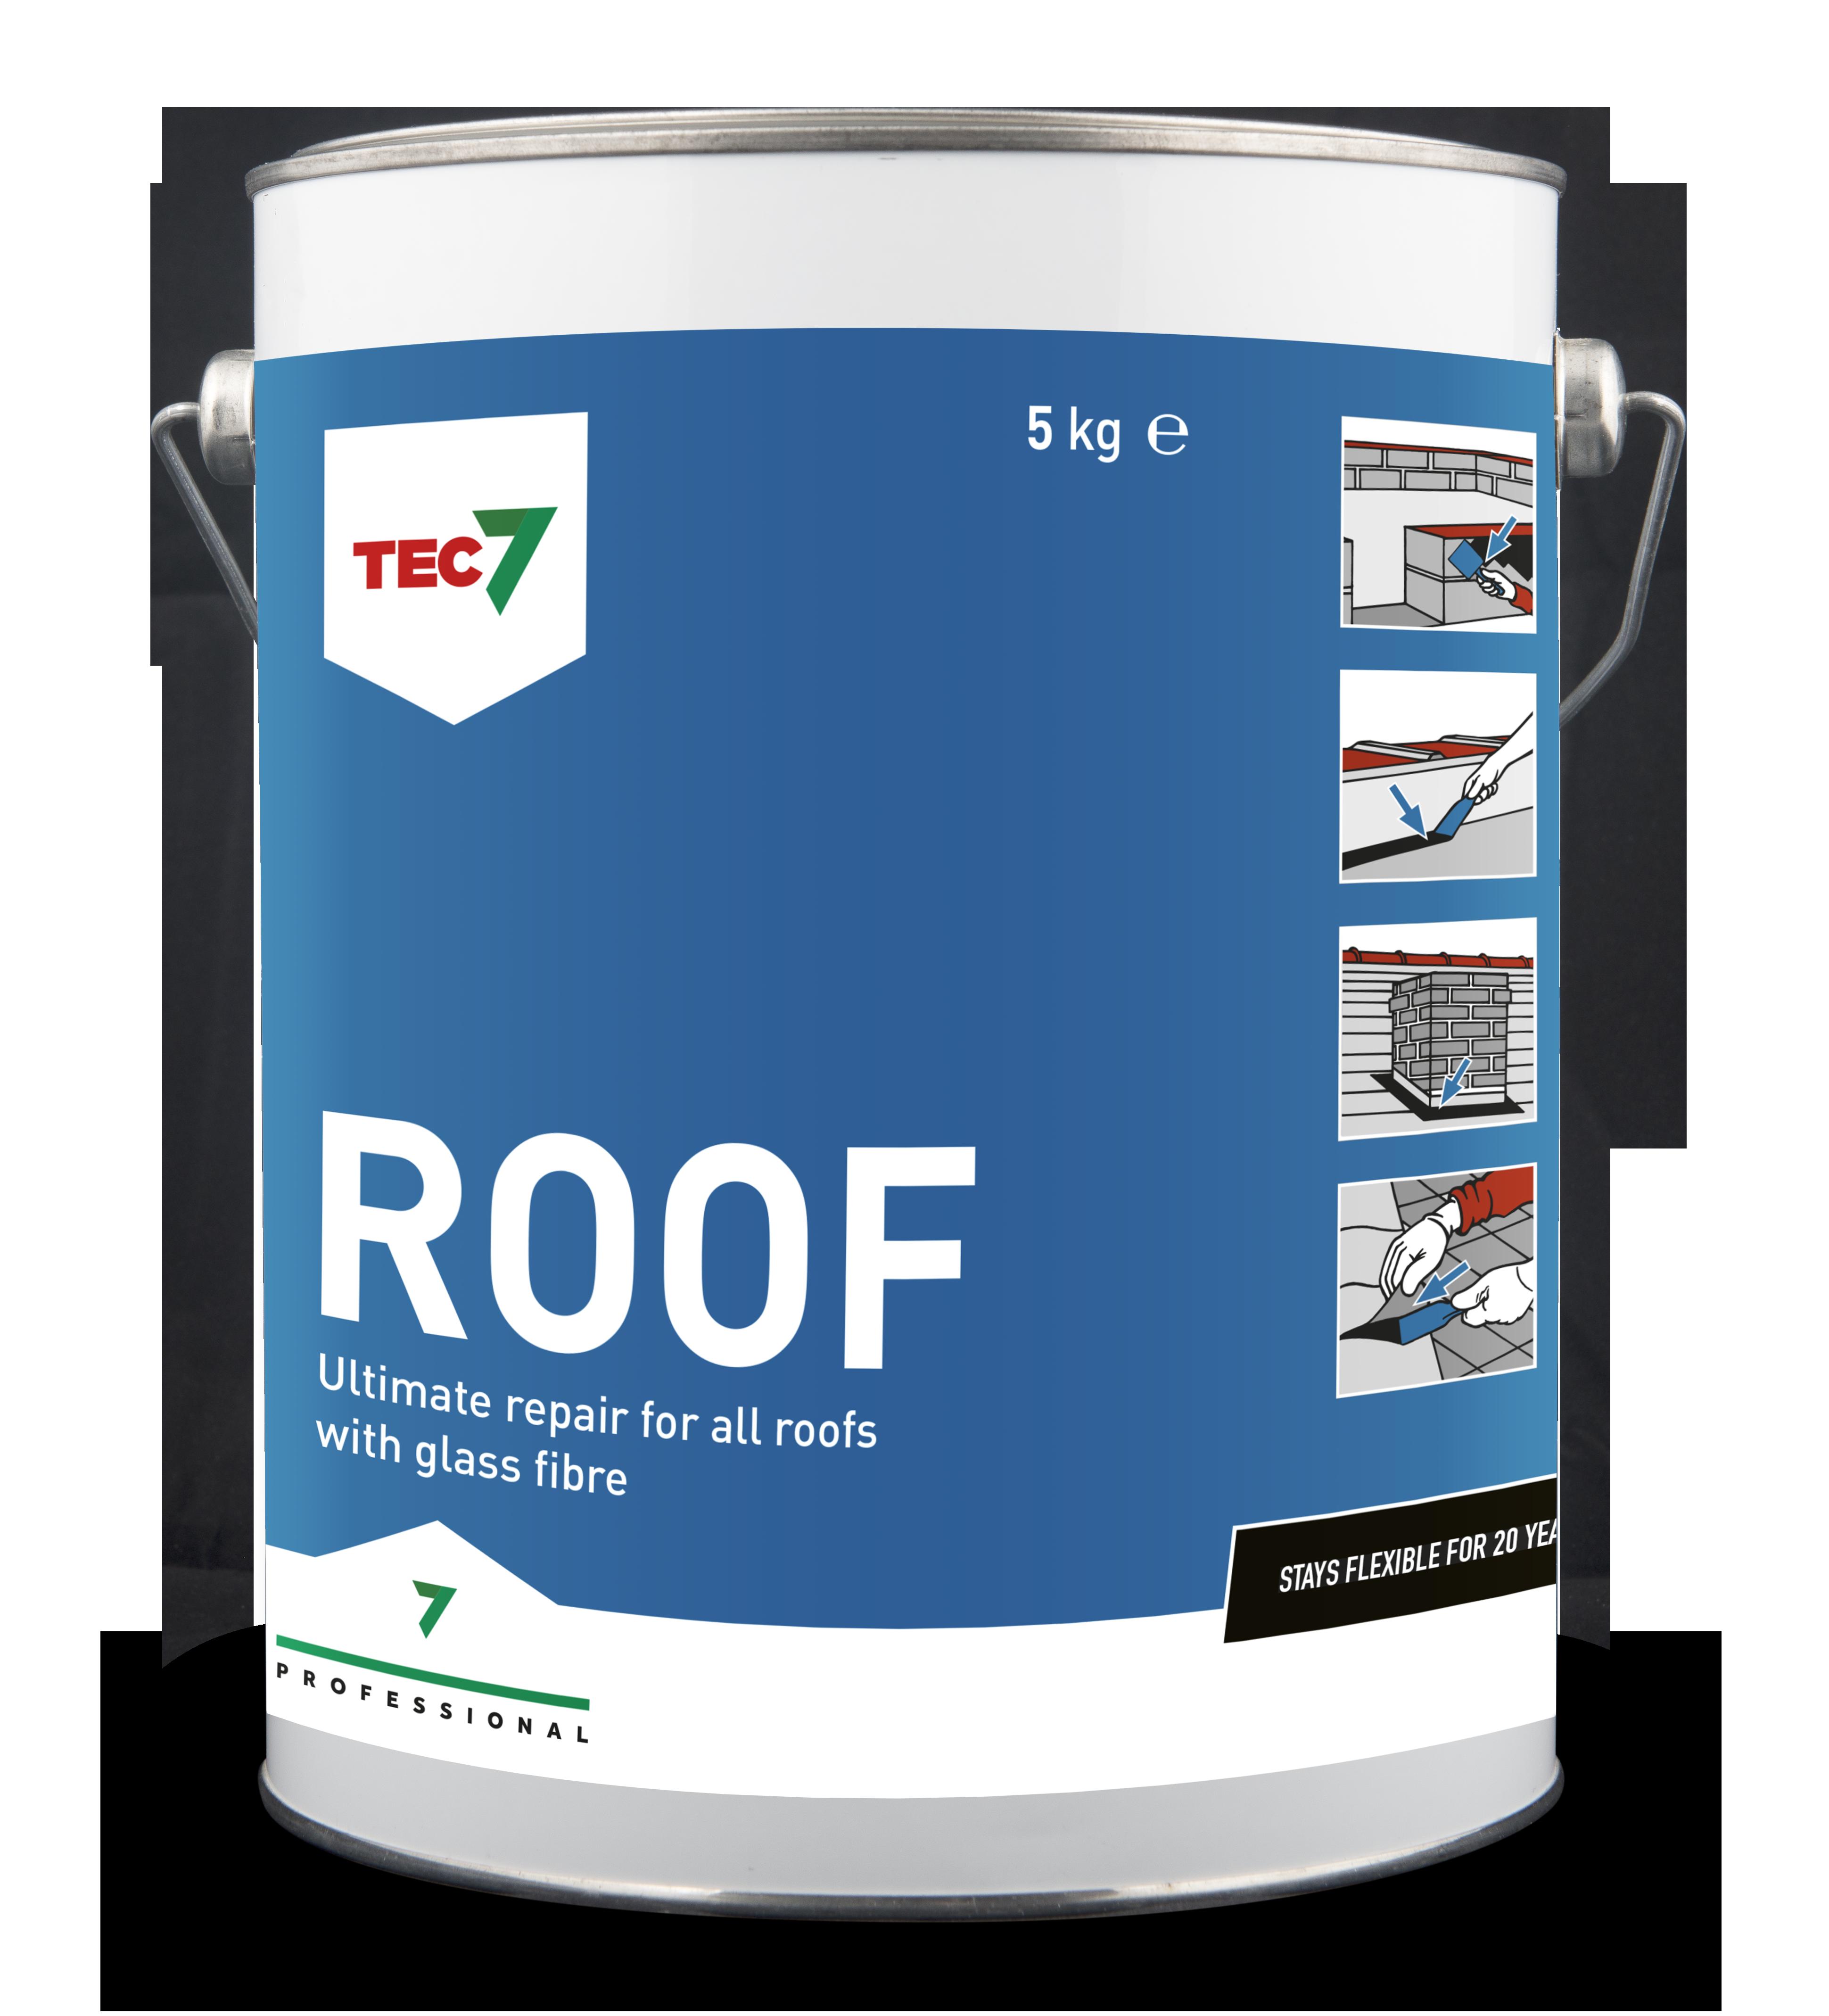 Roof7 Waterproof Sealing & Bonding 4.4 Litre